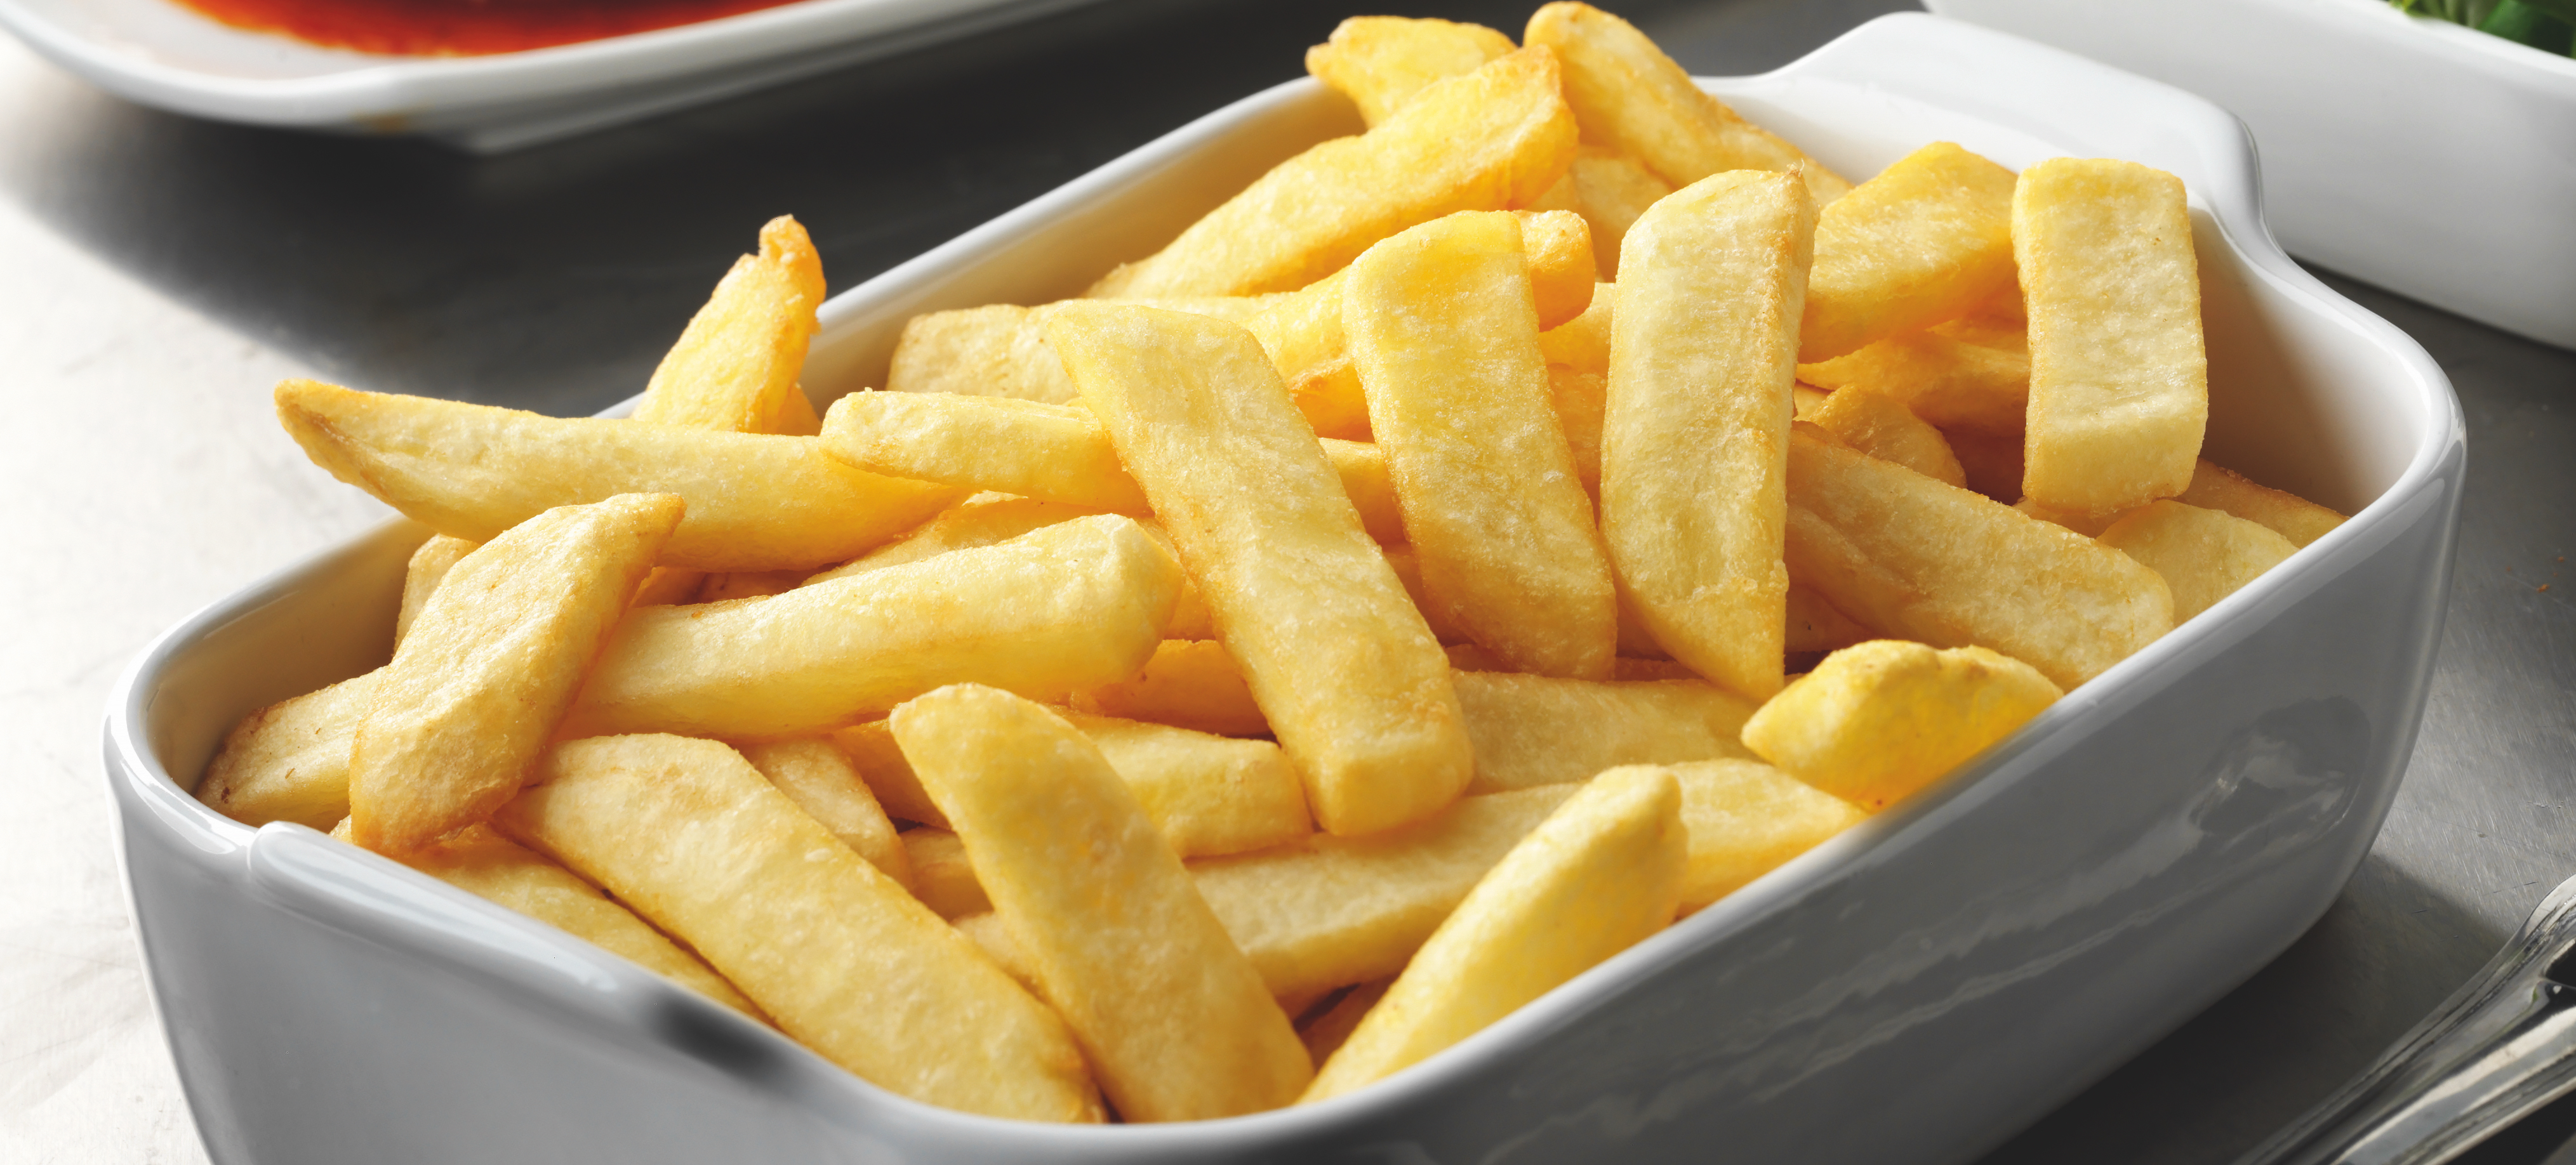 Oven Chips (Steak Cut) 2.5kg